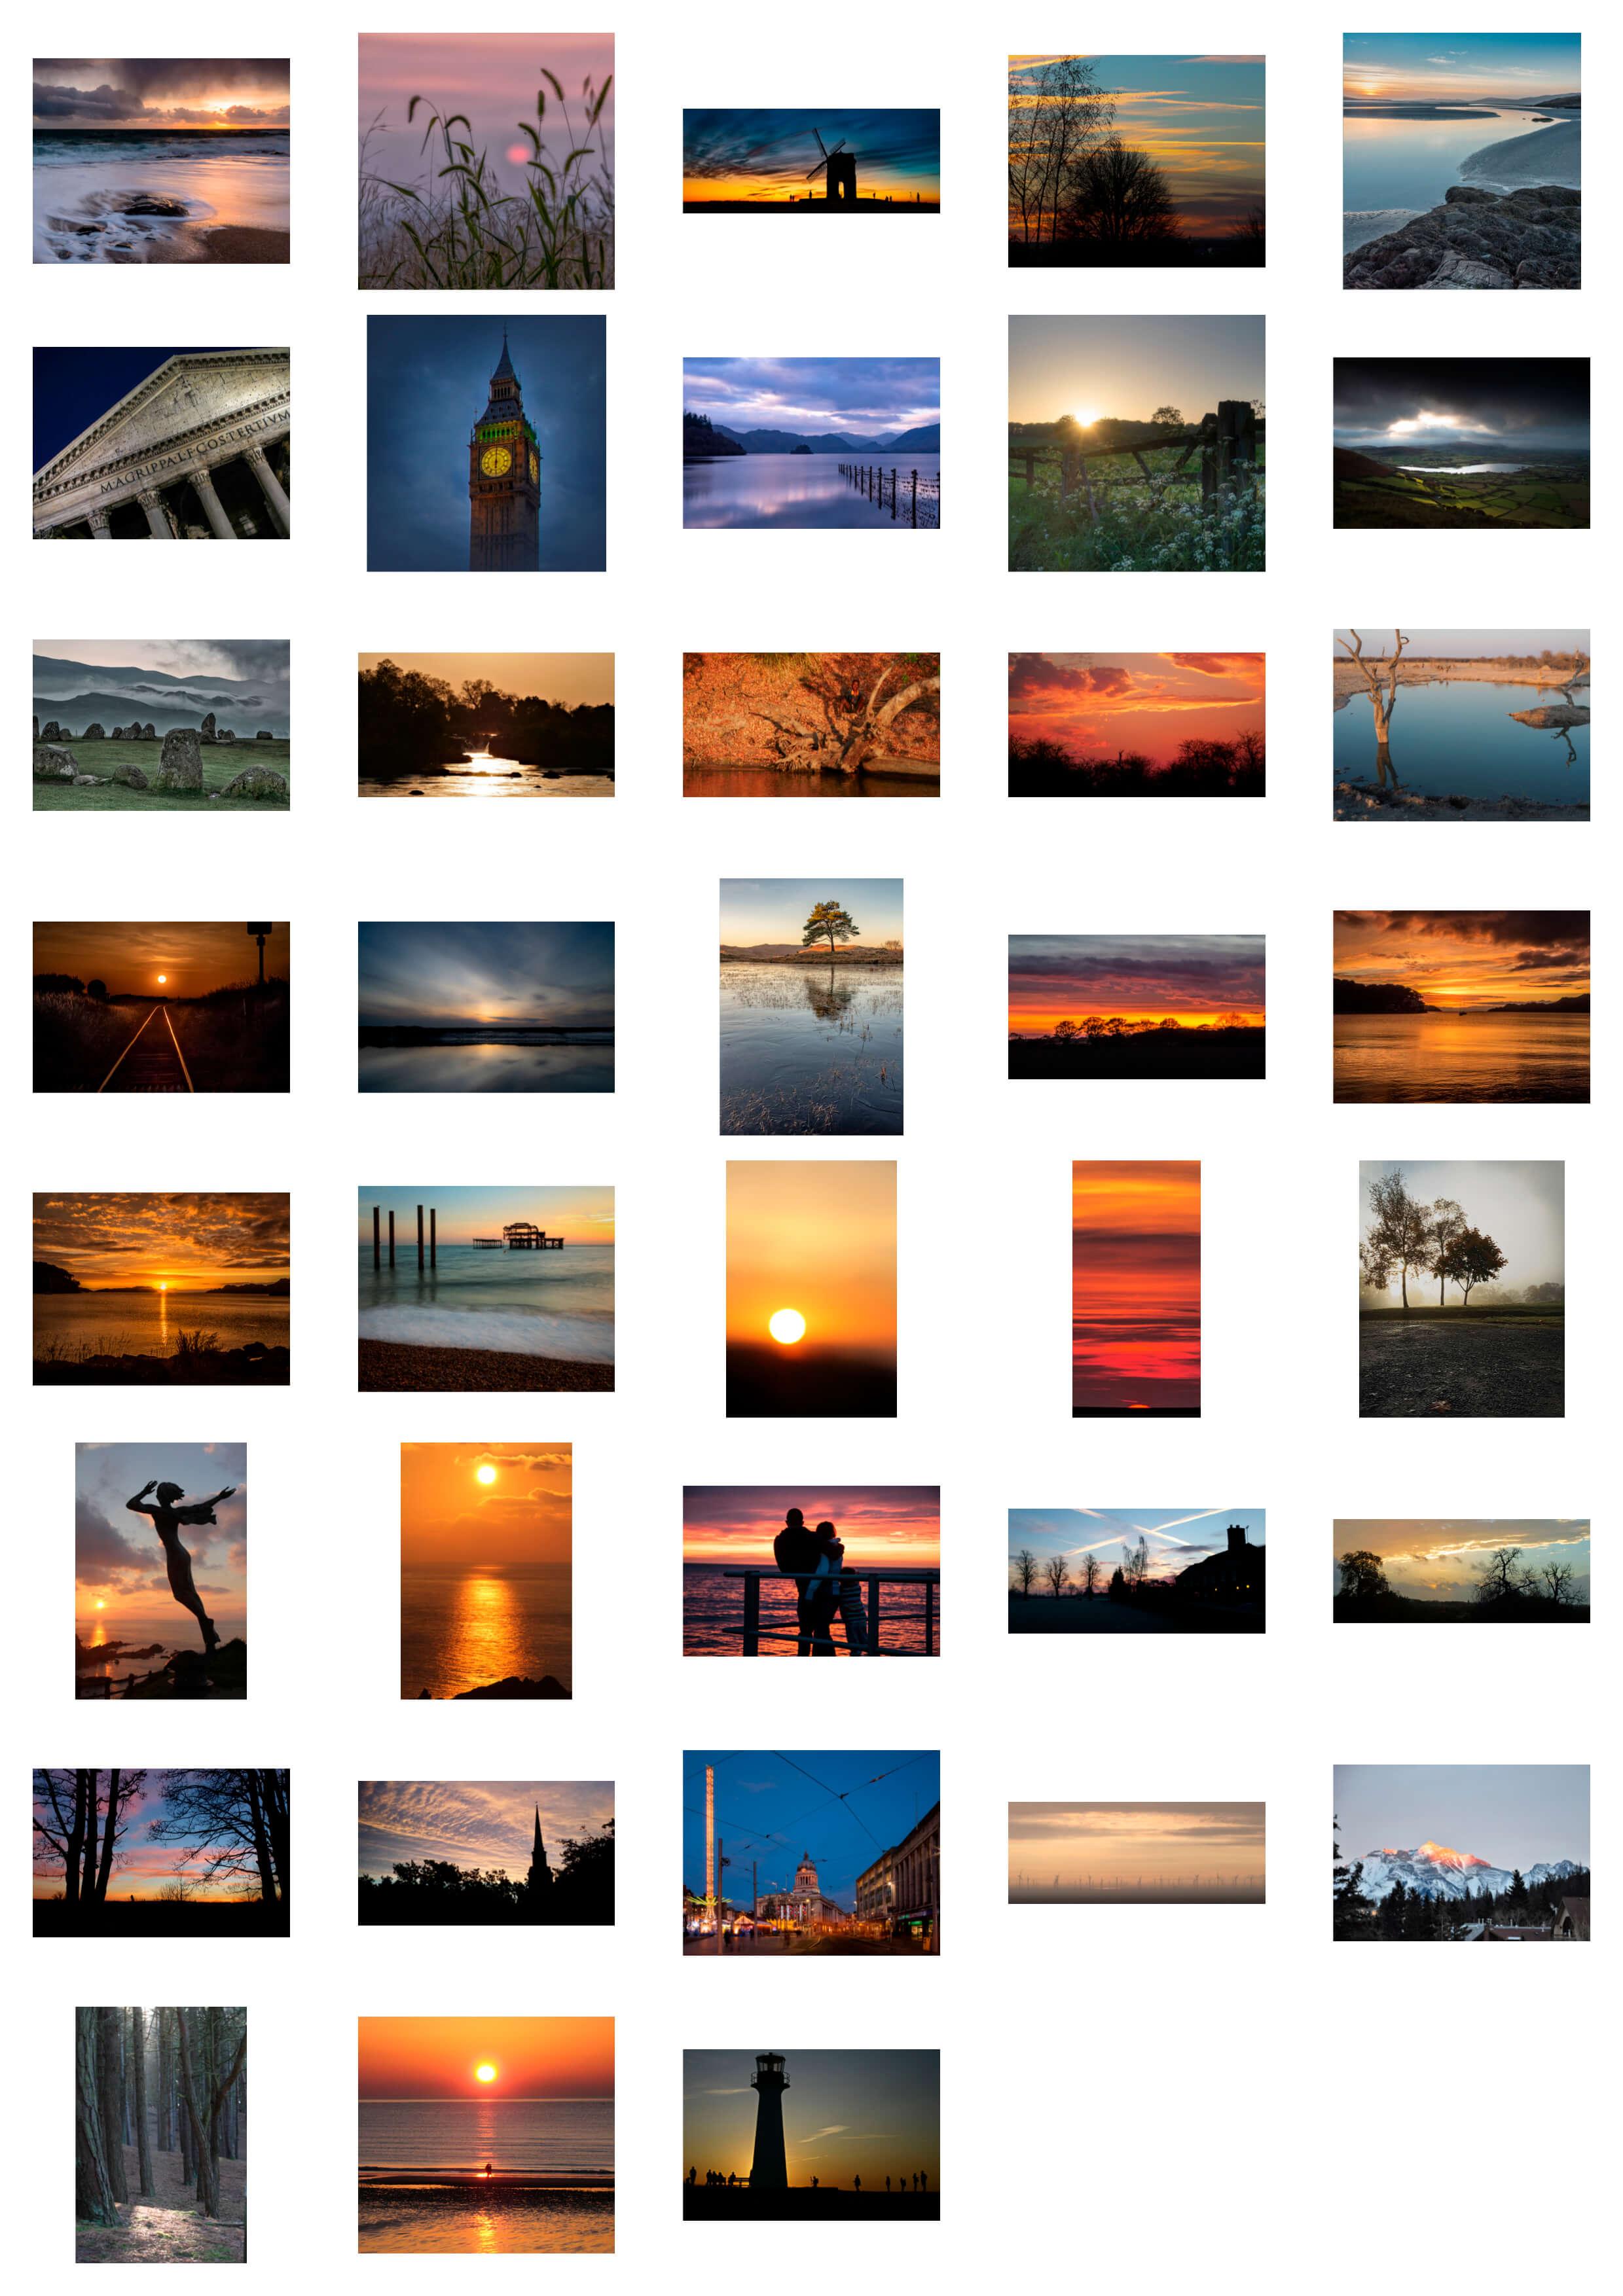 Sunrise - Sunset Entries